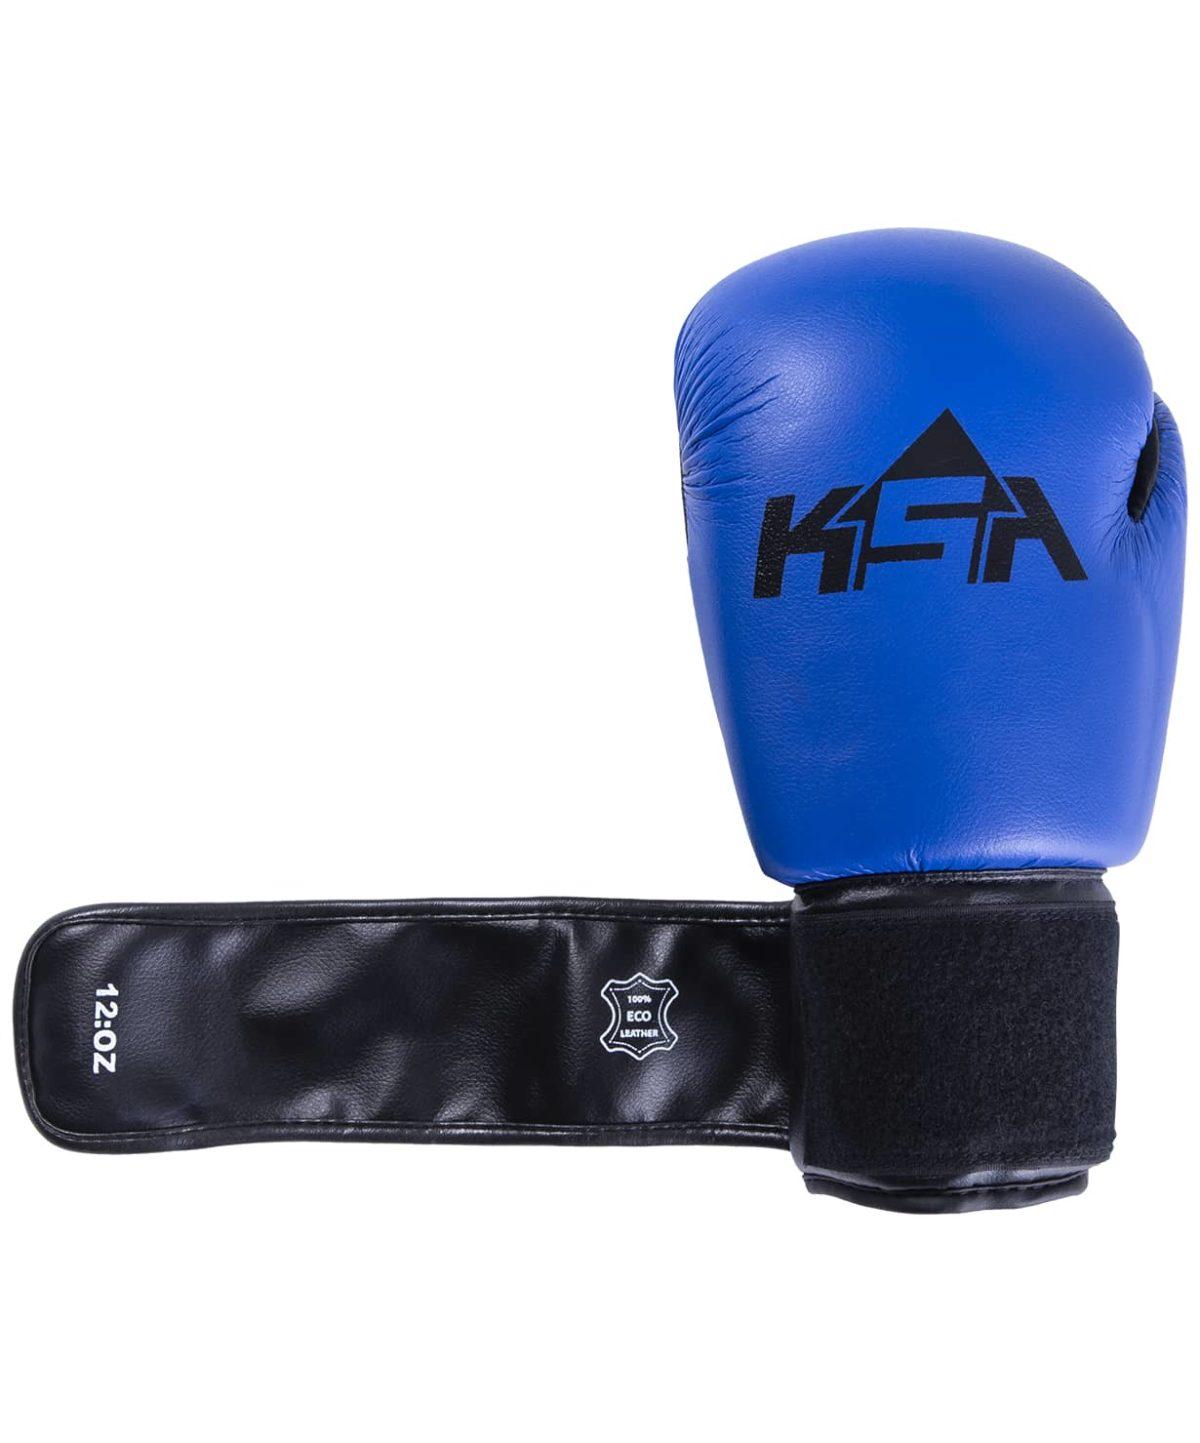 KSA Spider Red Перчатки боксерские, 8 oz, к/з 17811: синий - 2